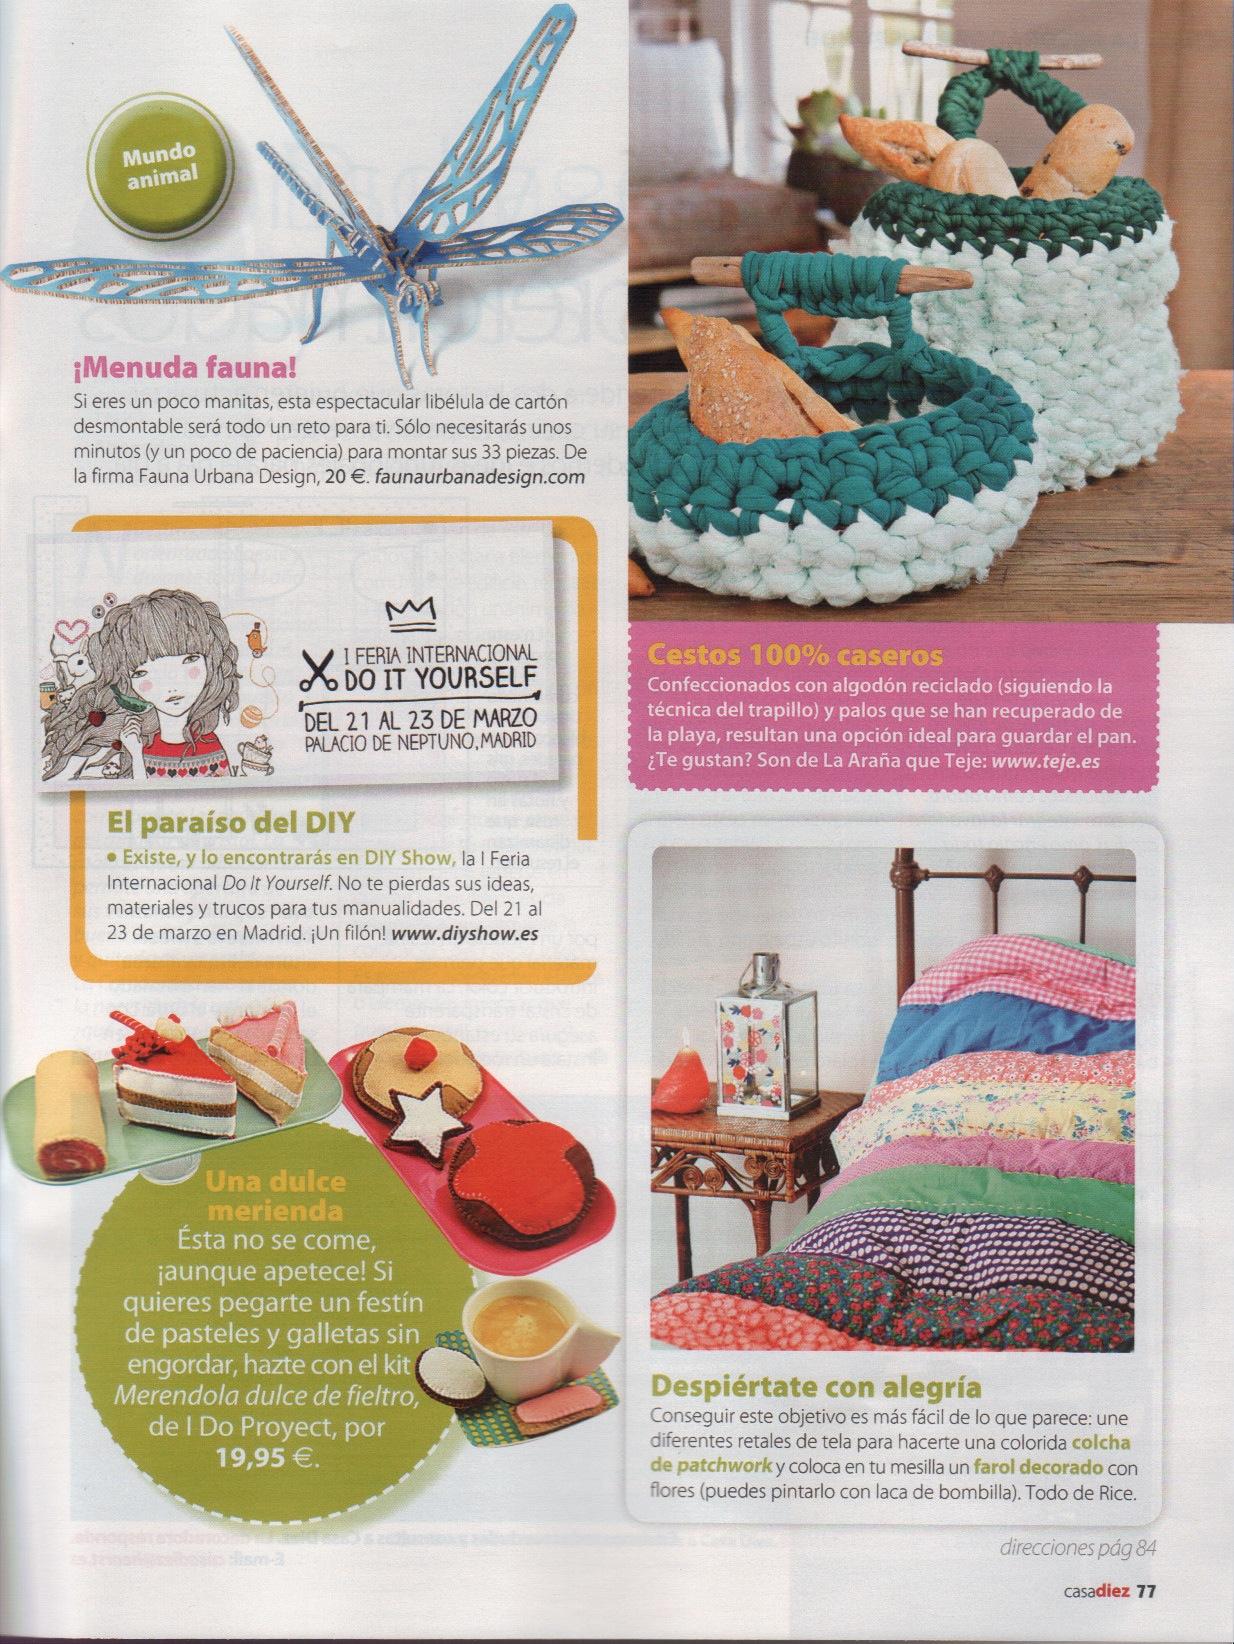 Casa diez revista sobre decoraci n 01 03 14 for Casa diez elle